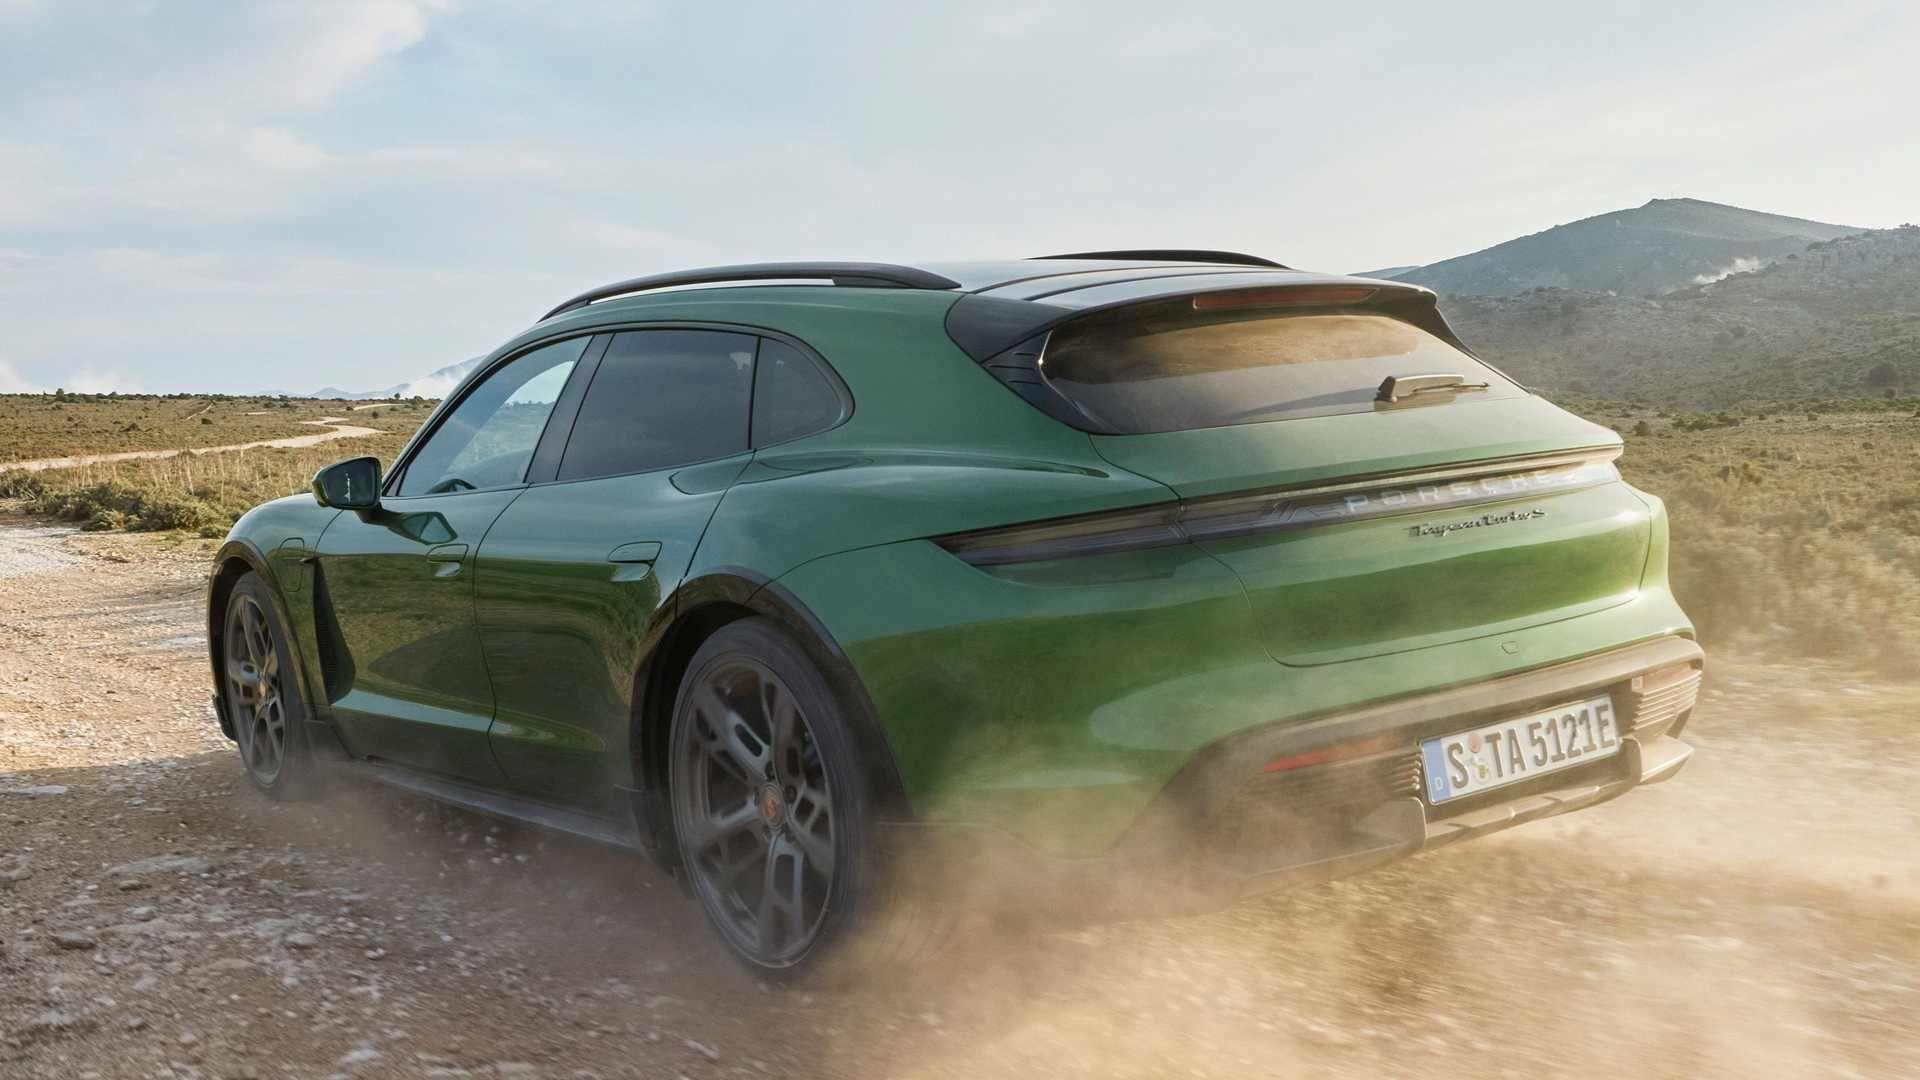 Porsche-Taycan-Cross-Turismo-7